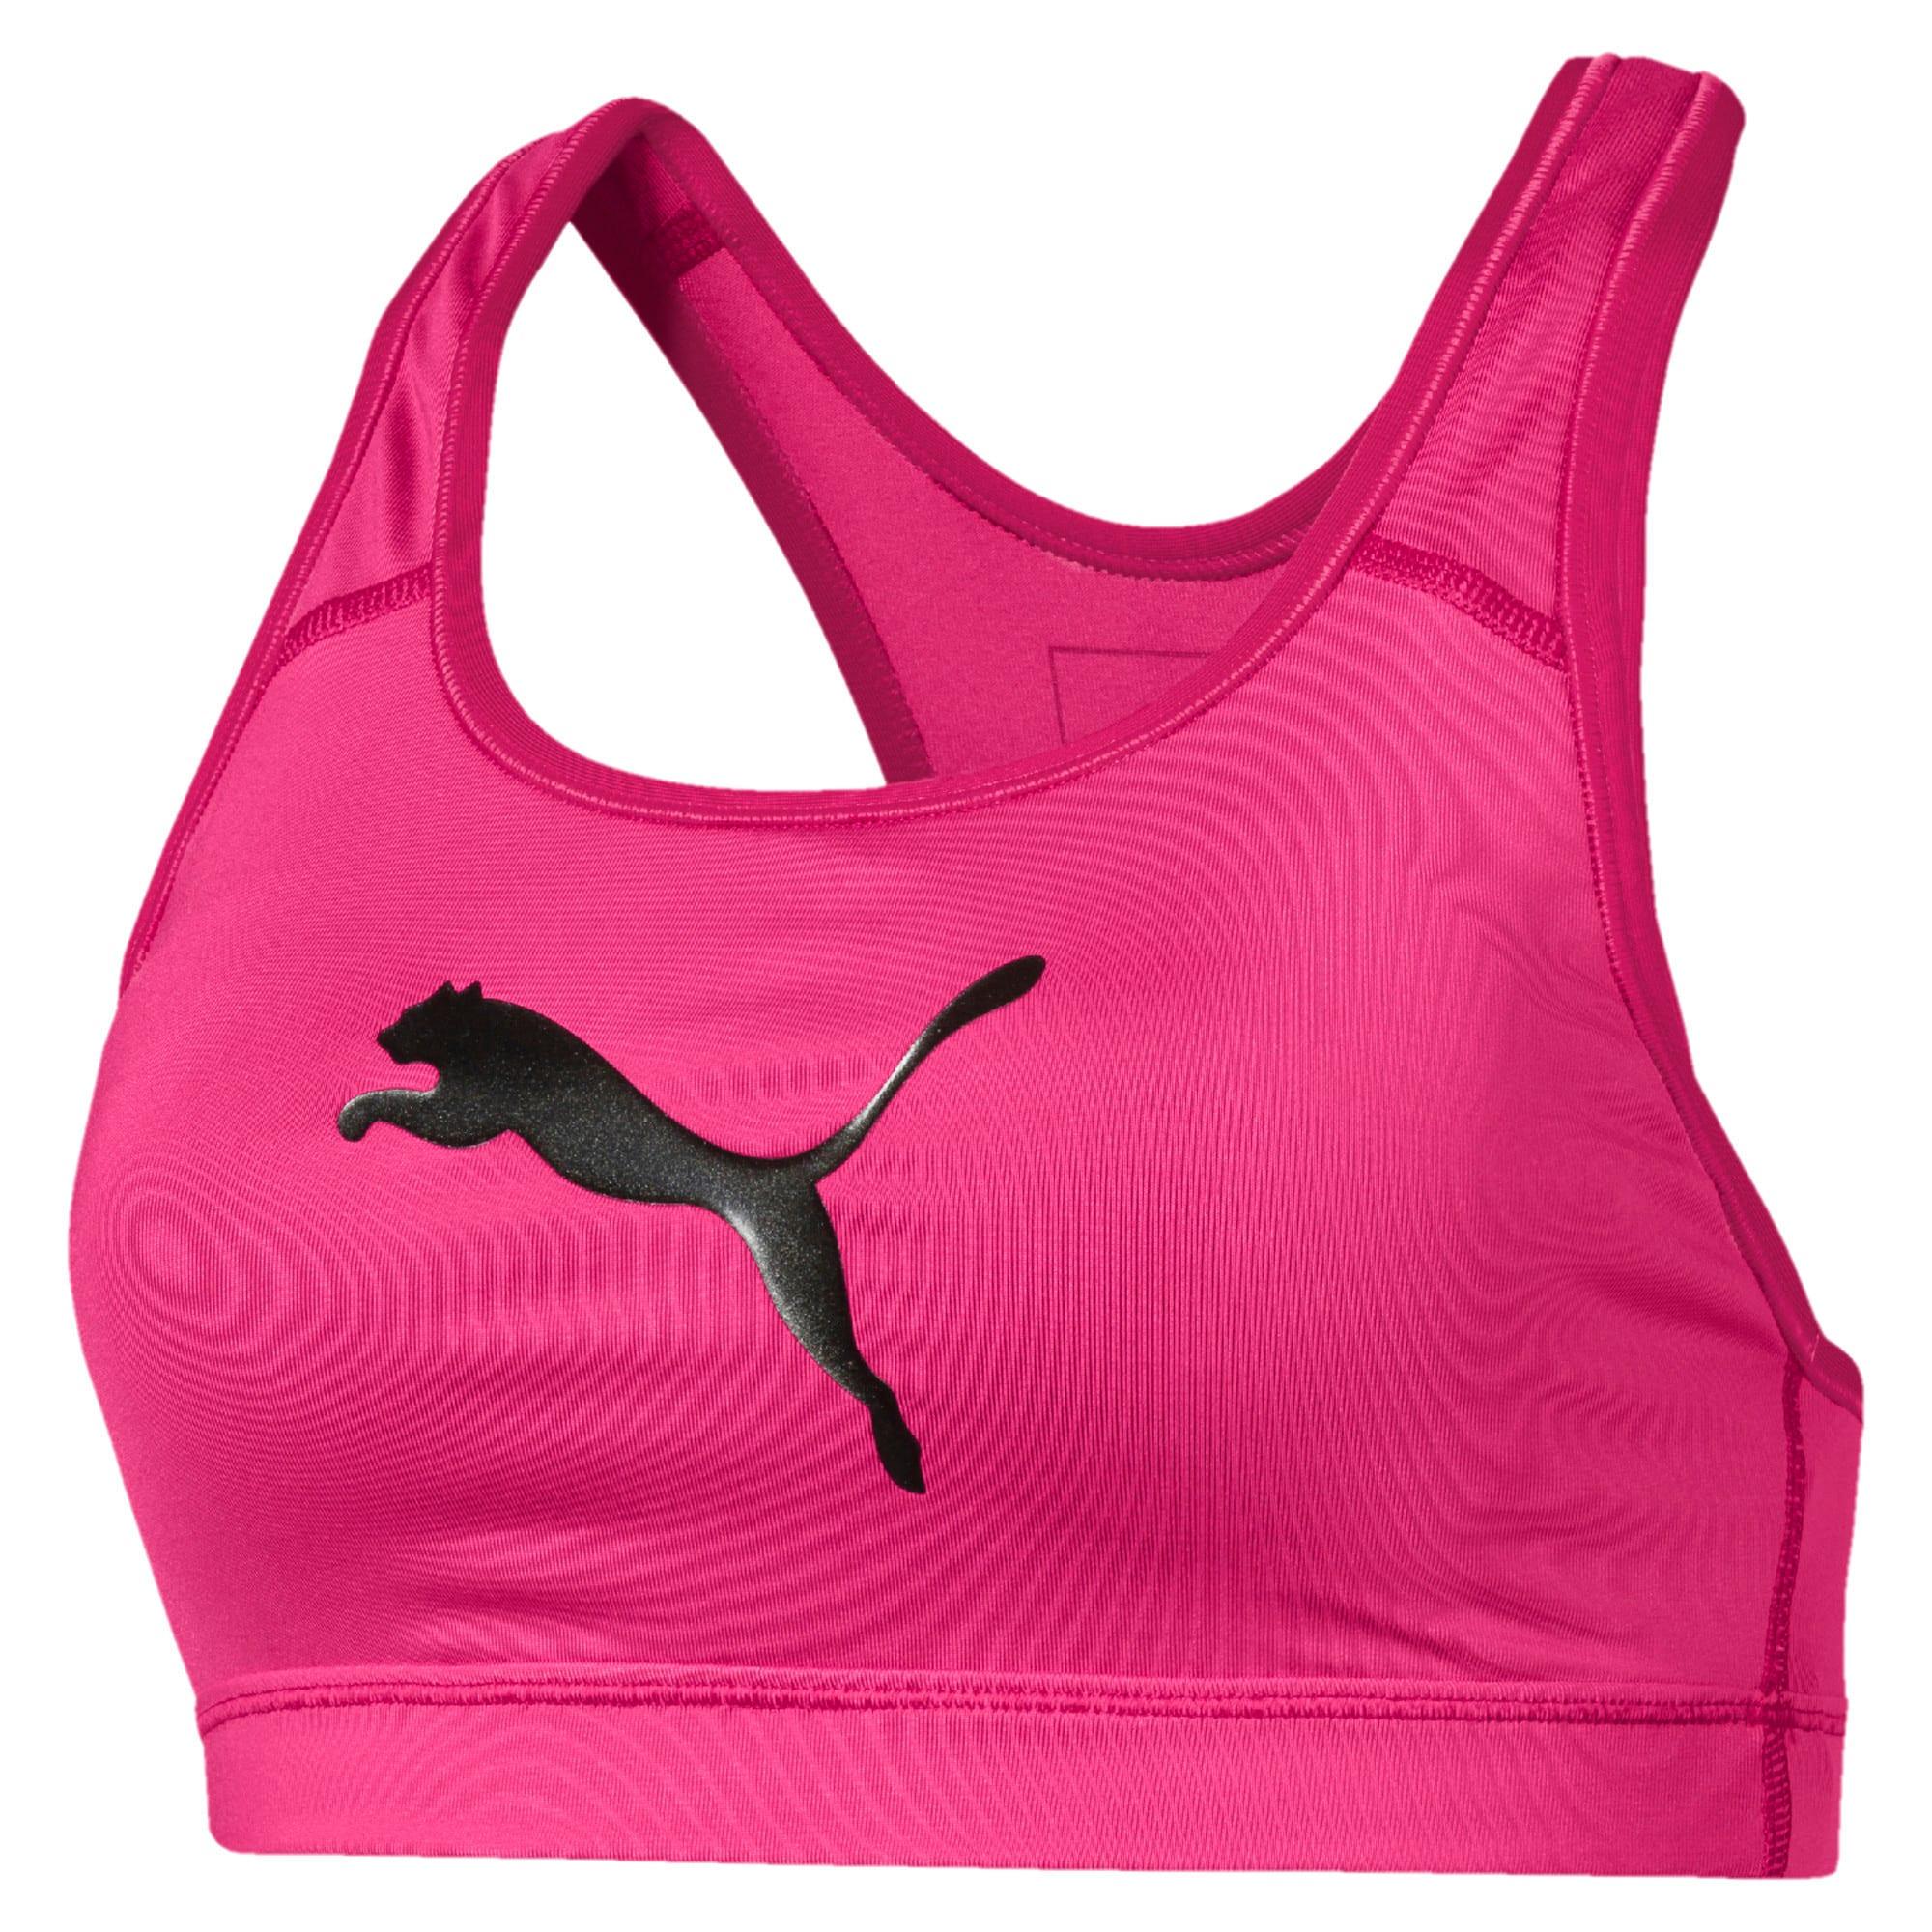 Thumbnail 4 of Training Women's 4Keeps Mid Impact Bra Top, Fuchsia Purple-CAT, medium-IND